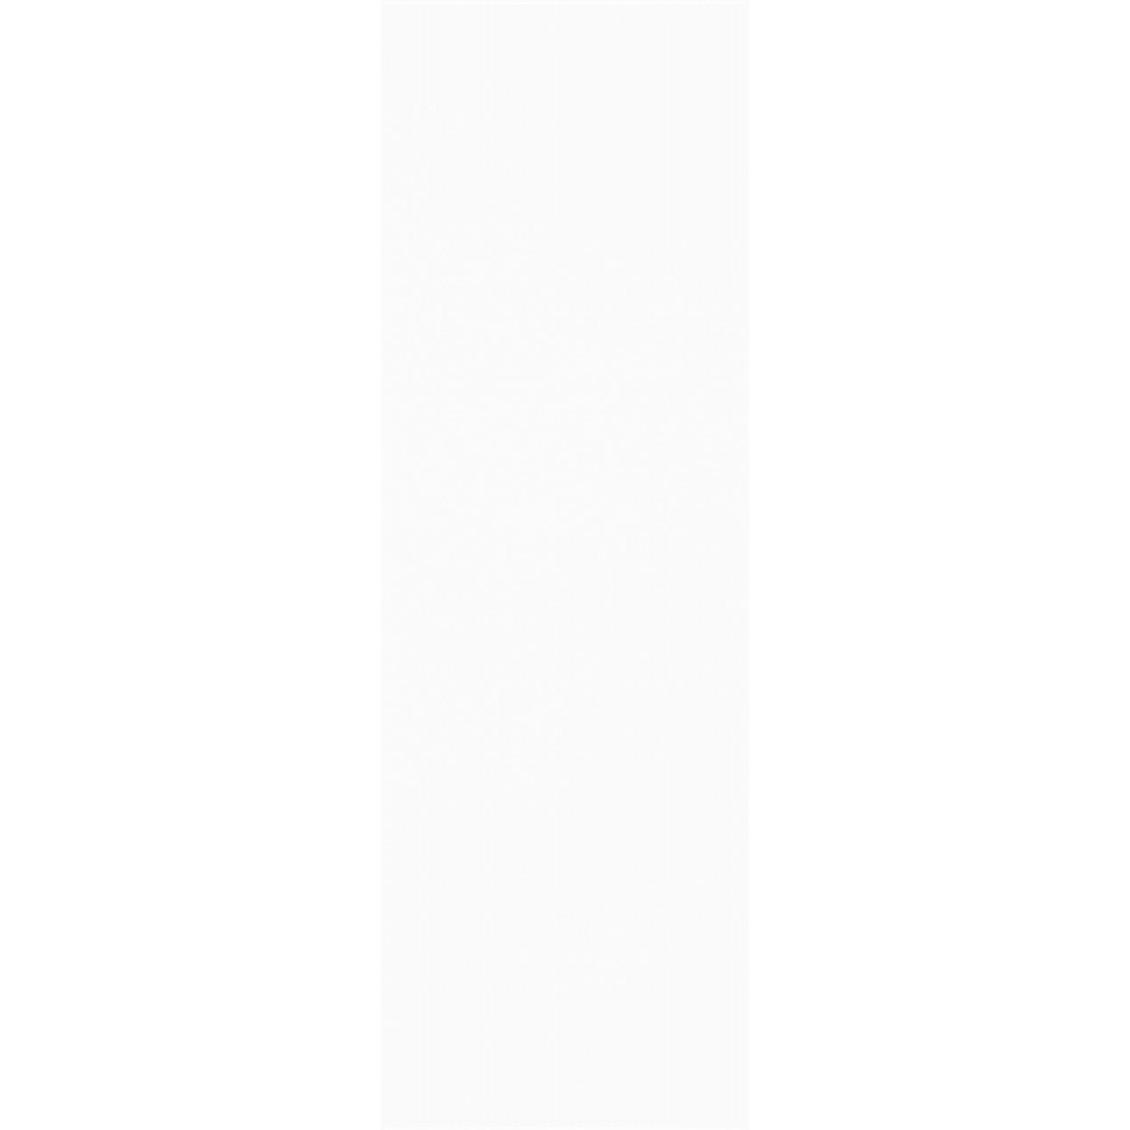 Revestimento Tipo A Linear 10x30 cm - Eliane